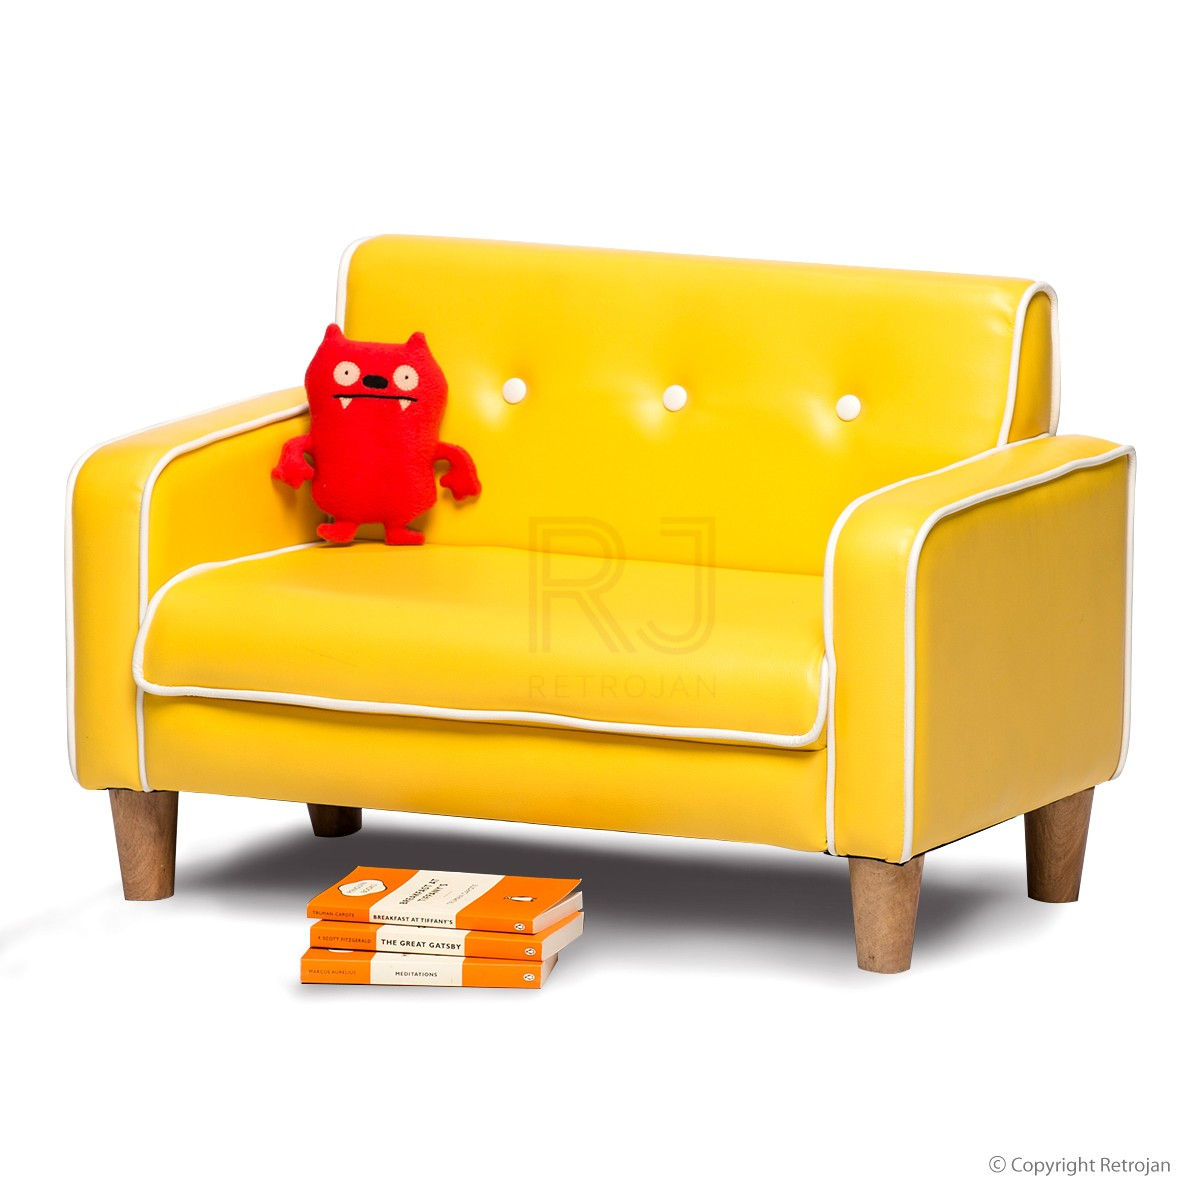 kids sofas buy el nino kids sofa (yellow) online | kids furniture - retrojan NWJNIBP